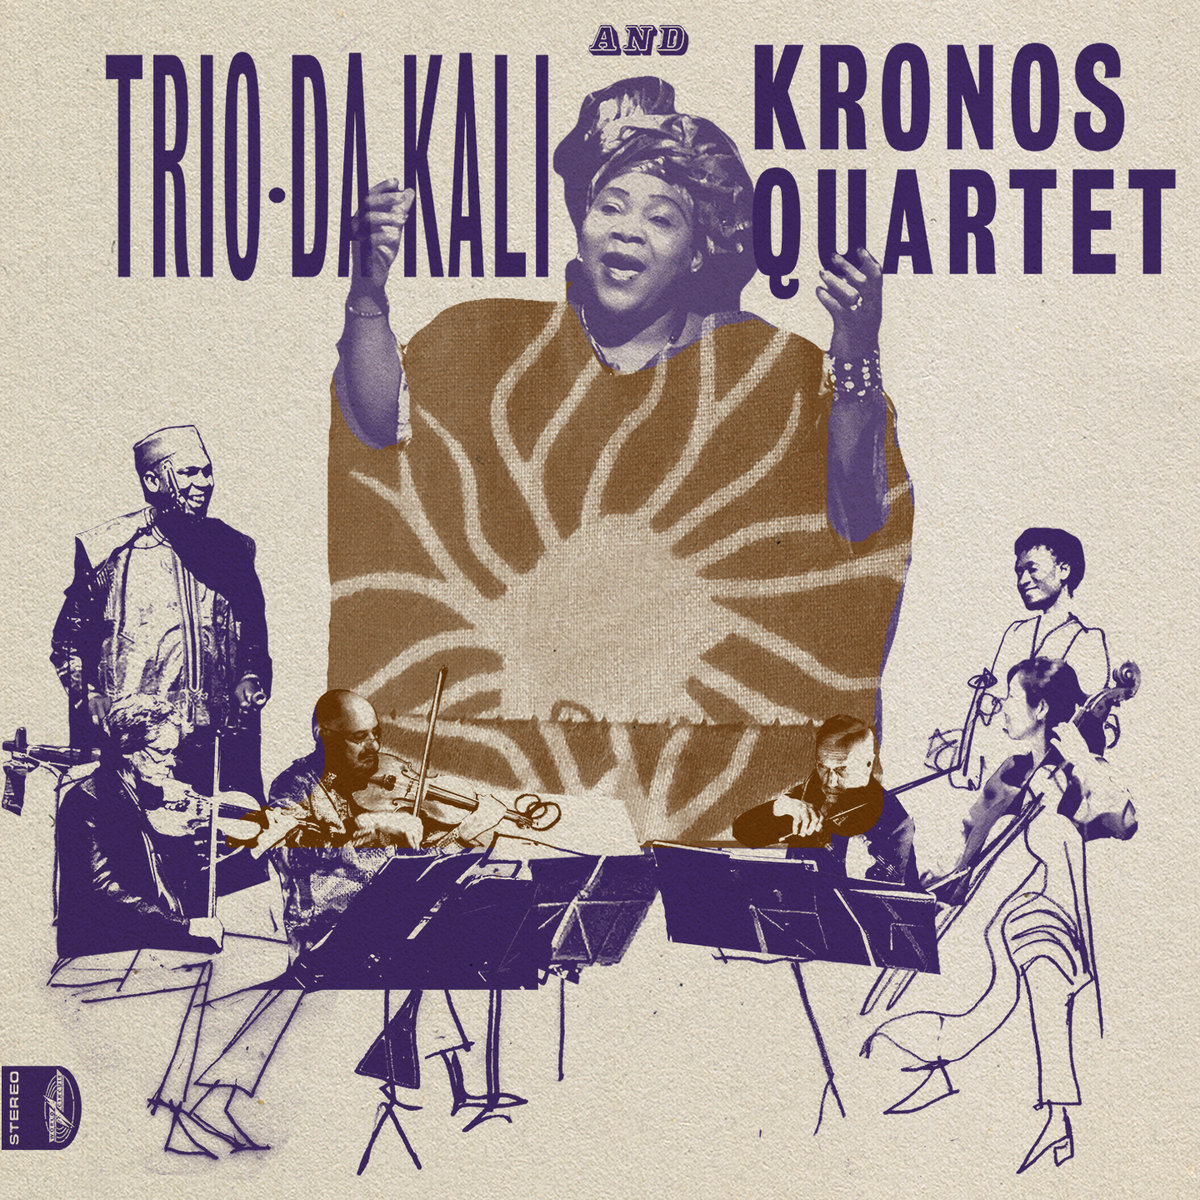 Trio Da Kali and Kronos Quartet - Ladilikan (CD) - World Circuit Records